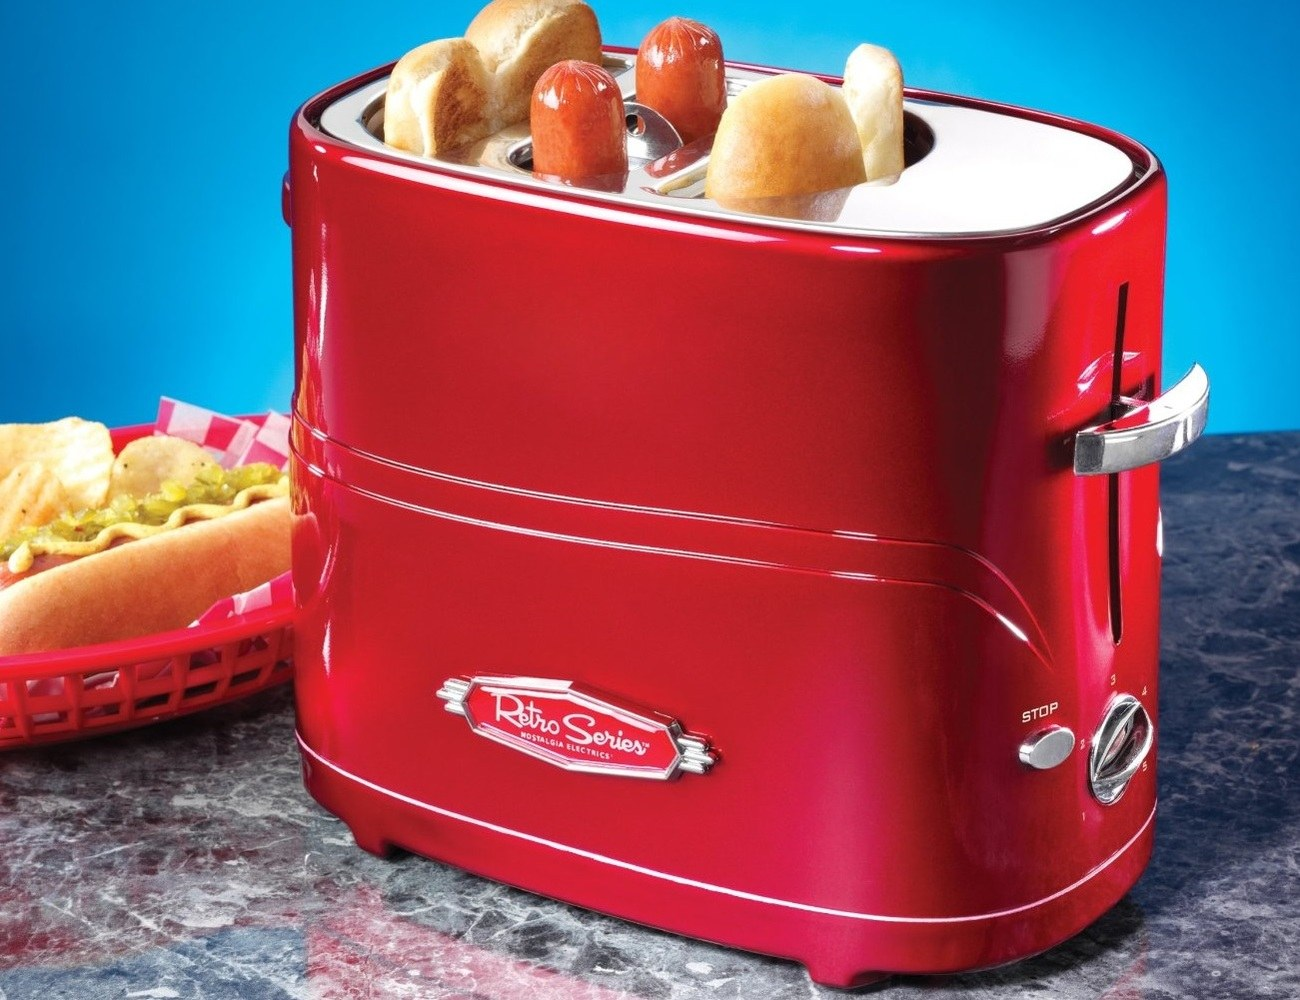 Retro+Series+Pop+Up+Hot+Dog+Toaster